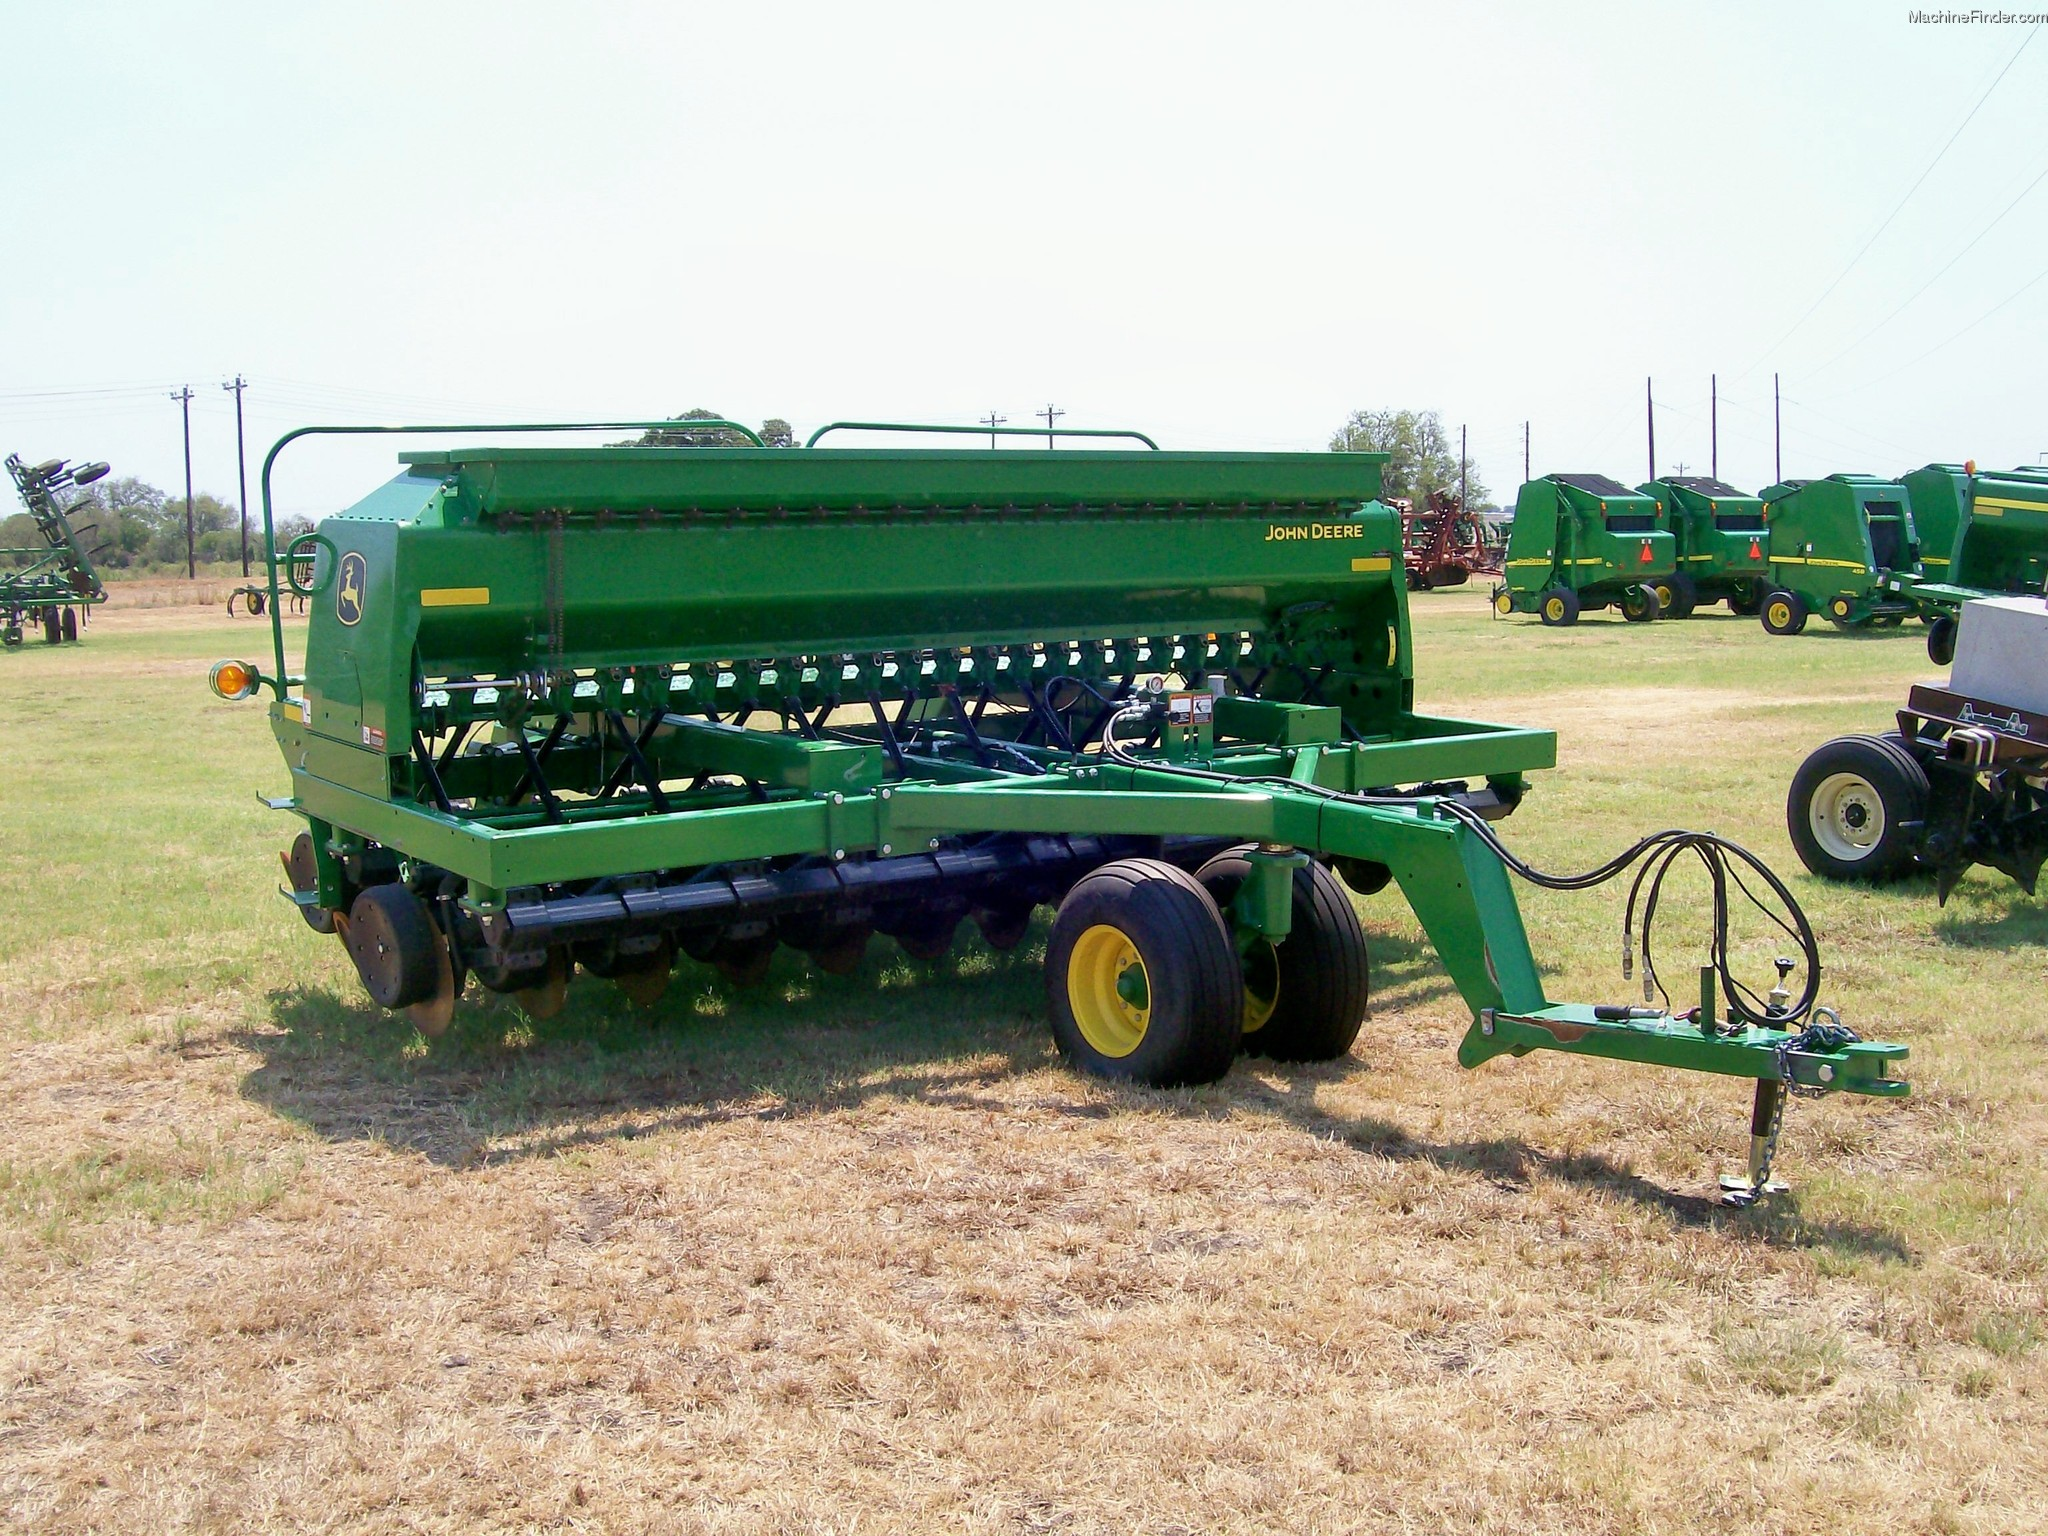 2013 John Deere 1590 Planting & Seeding - Box Drills - John Deere